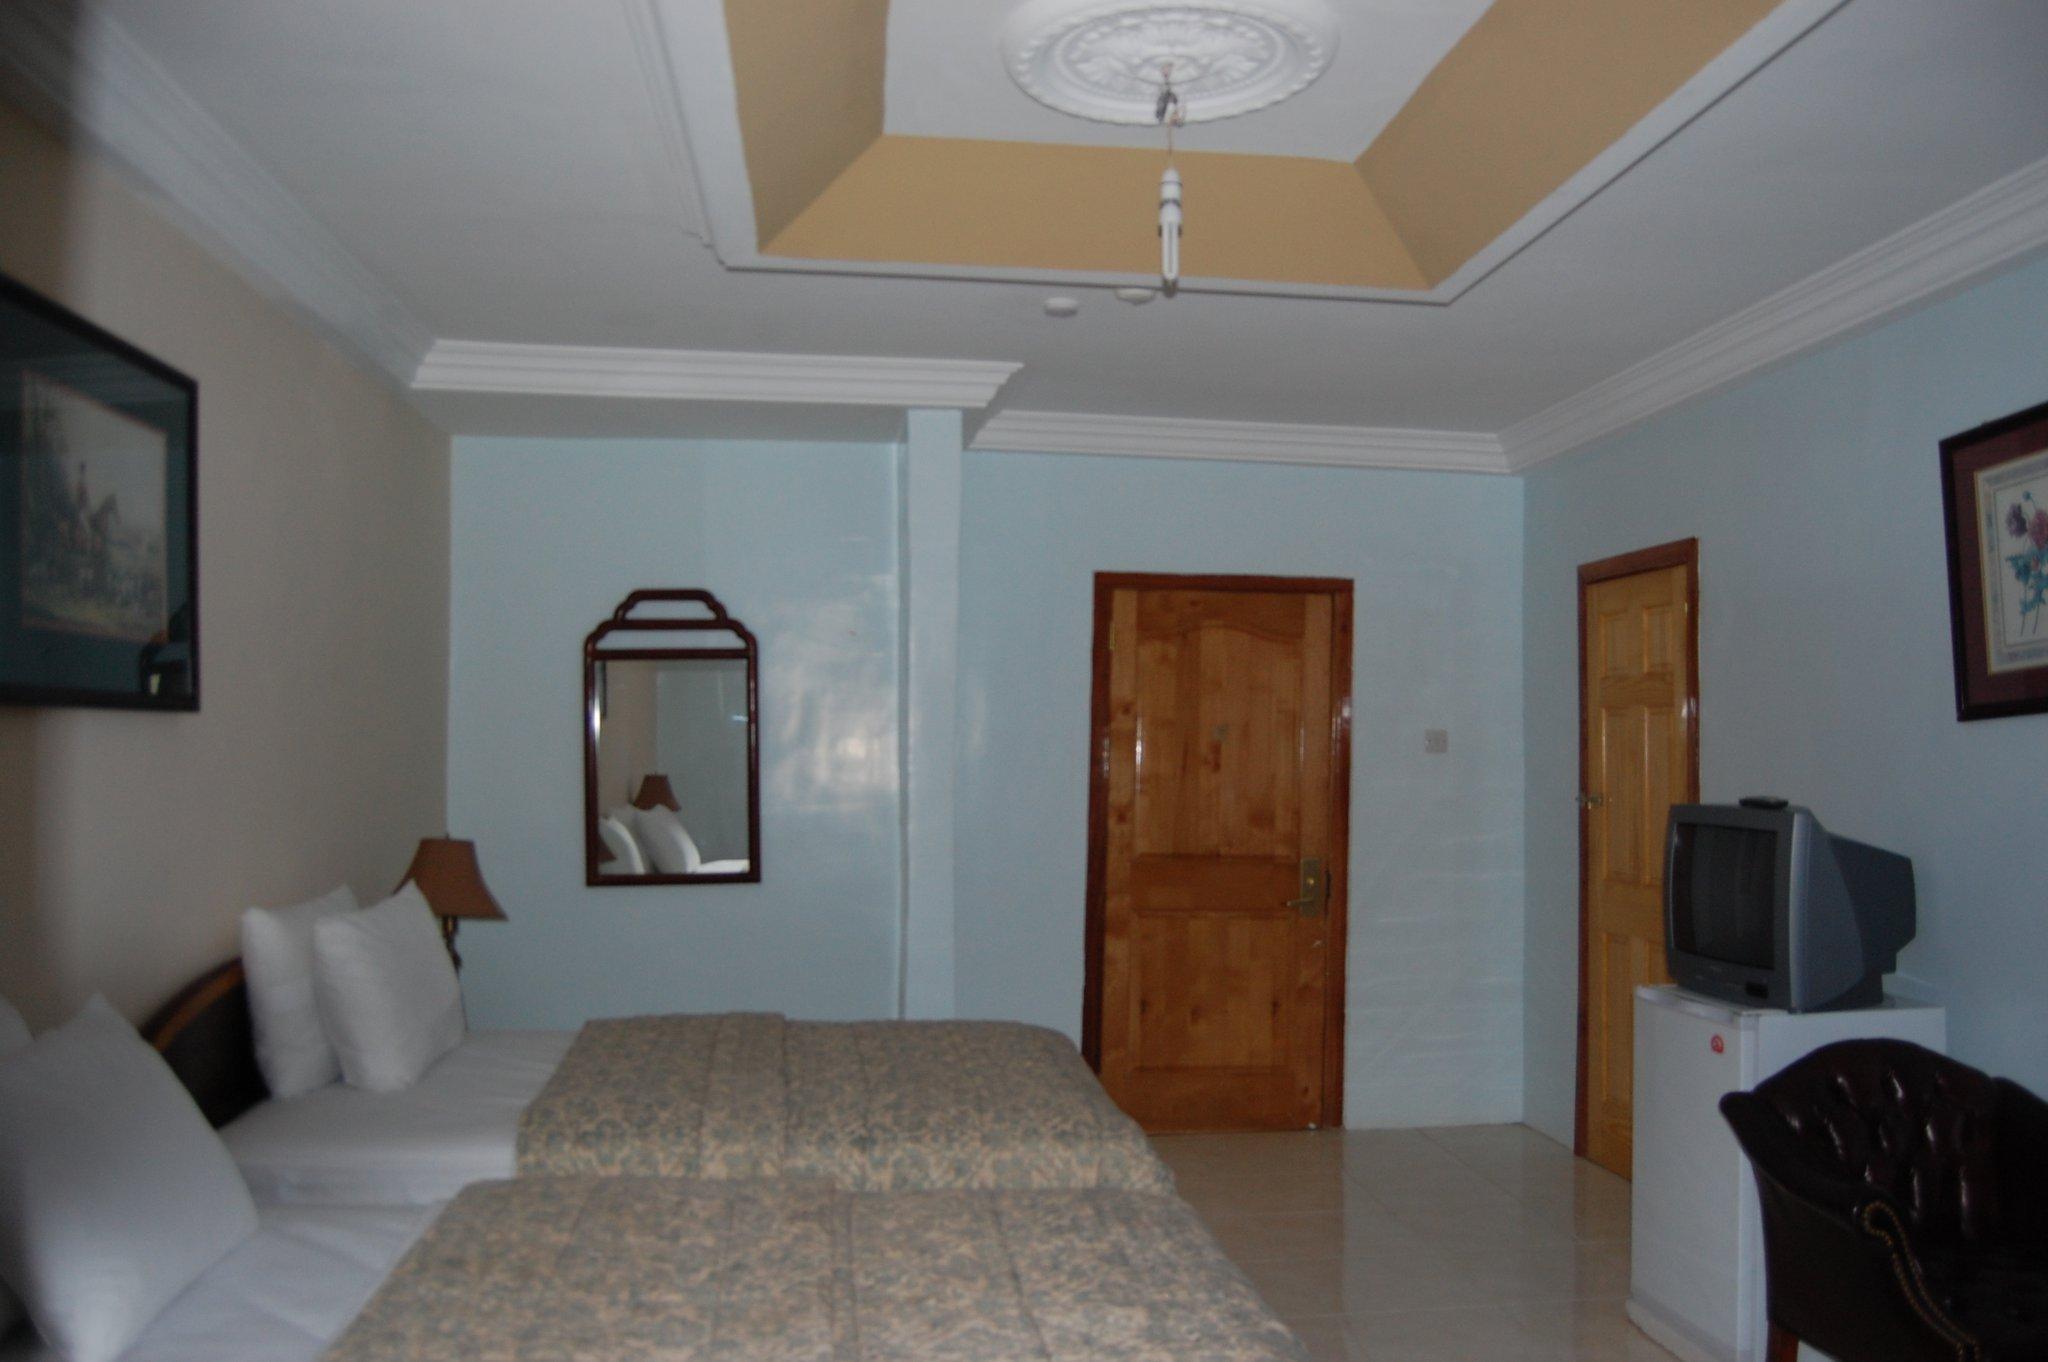 Ghlisting Hotels in Ghana, Events in Ghana |   adonaiH27